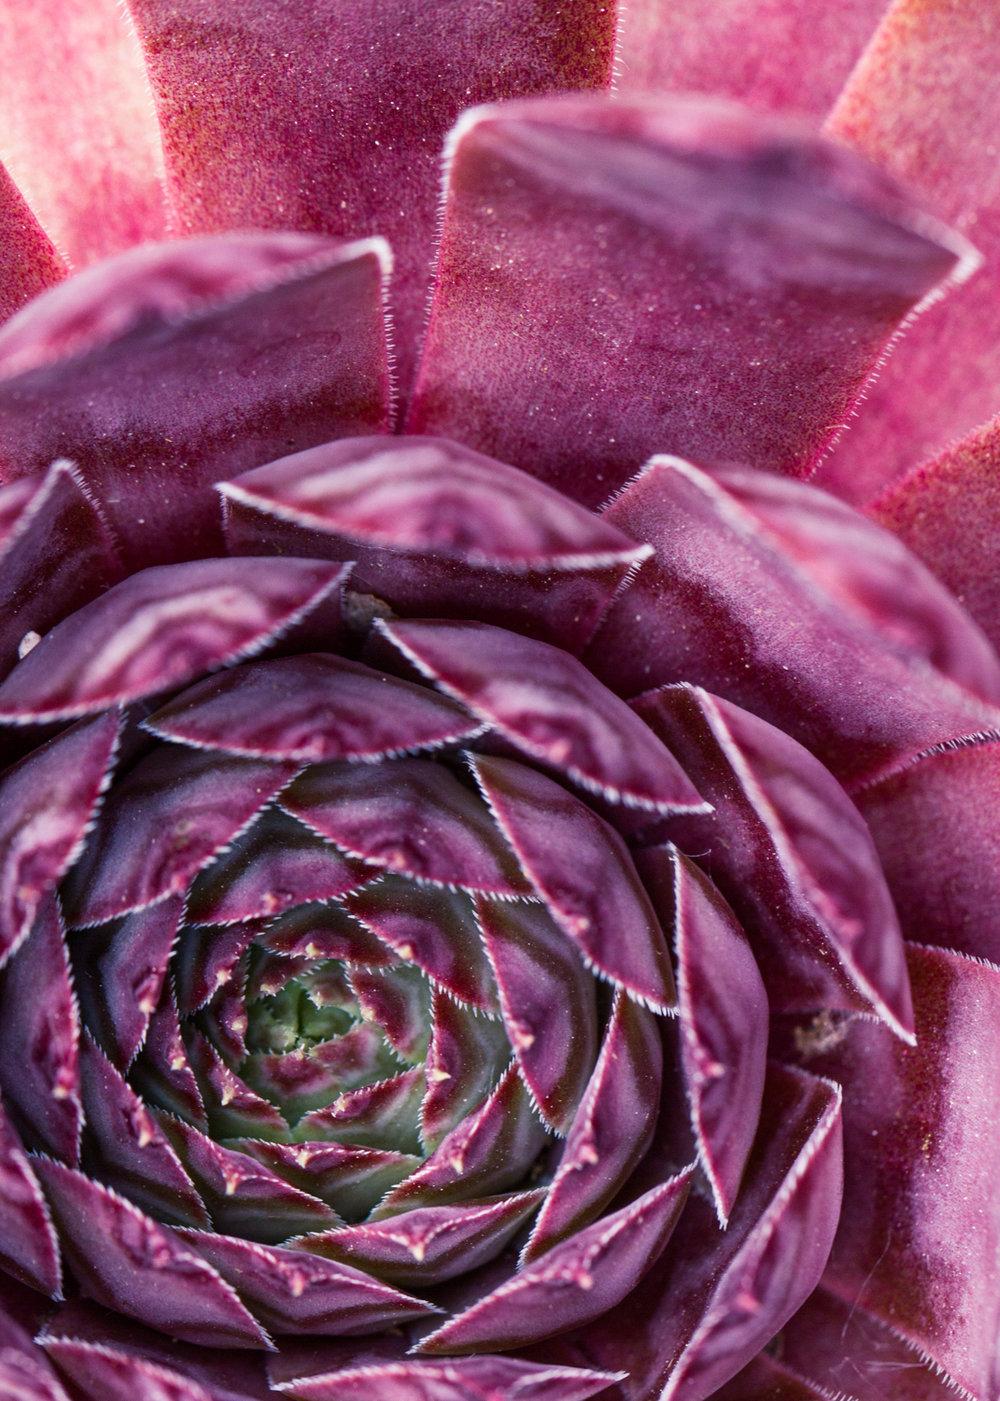 July-Blog-Macro-Photography-Flora-Ann-Arbor-Jaymes-Dempsey-25.JPG